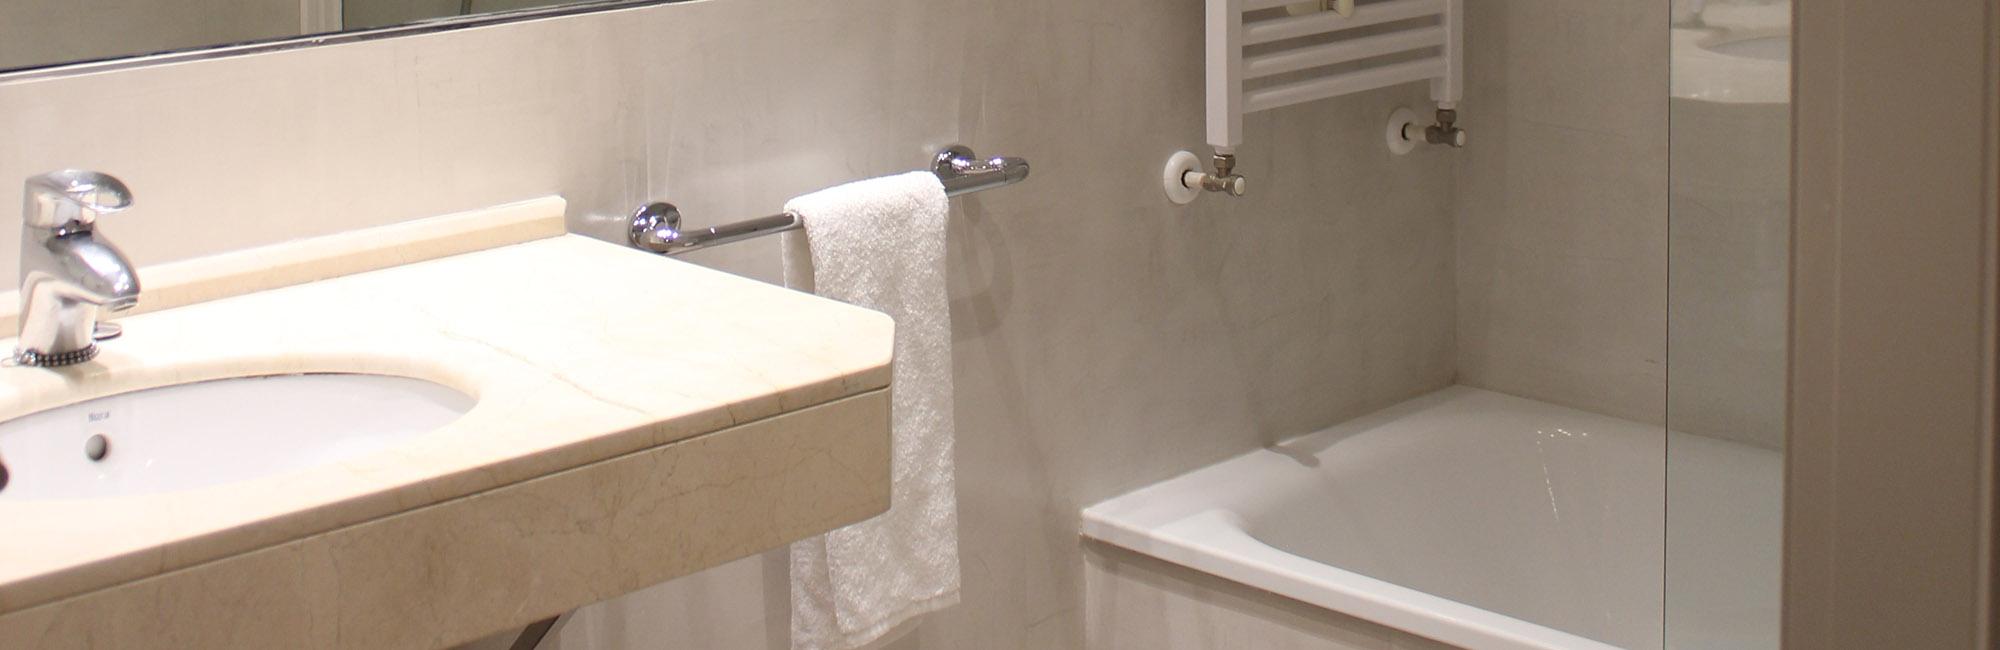 Baño Suite Hotel Carreño